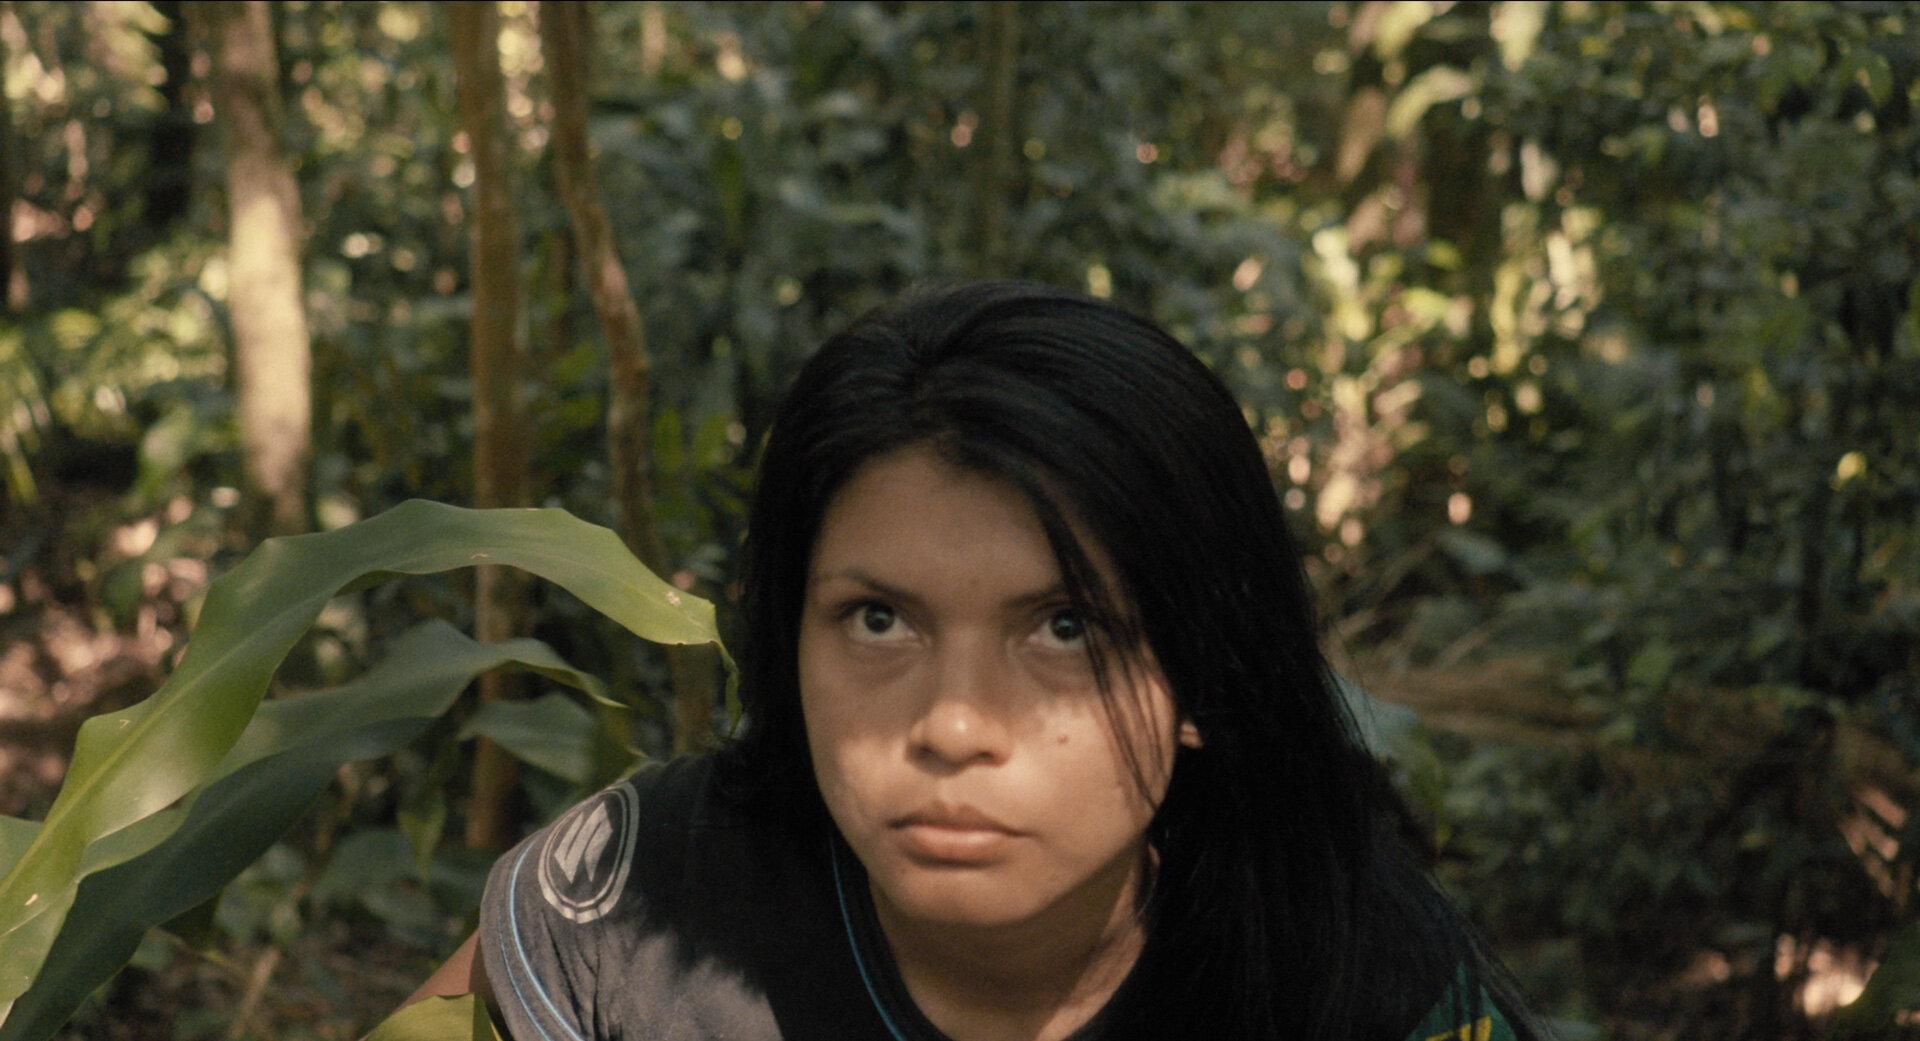 Semente-Exterminadora-Exterminator-Seed-Pedro-Neves-Marques-2017-film-still-2.jpg